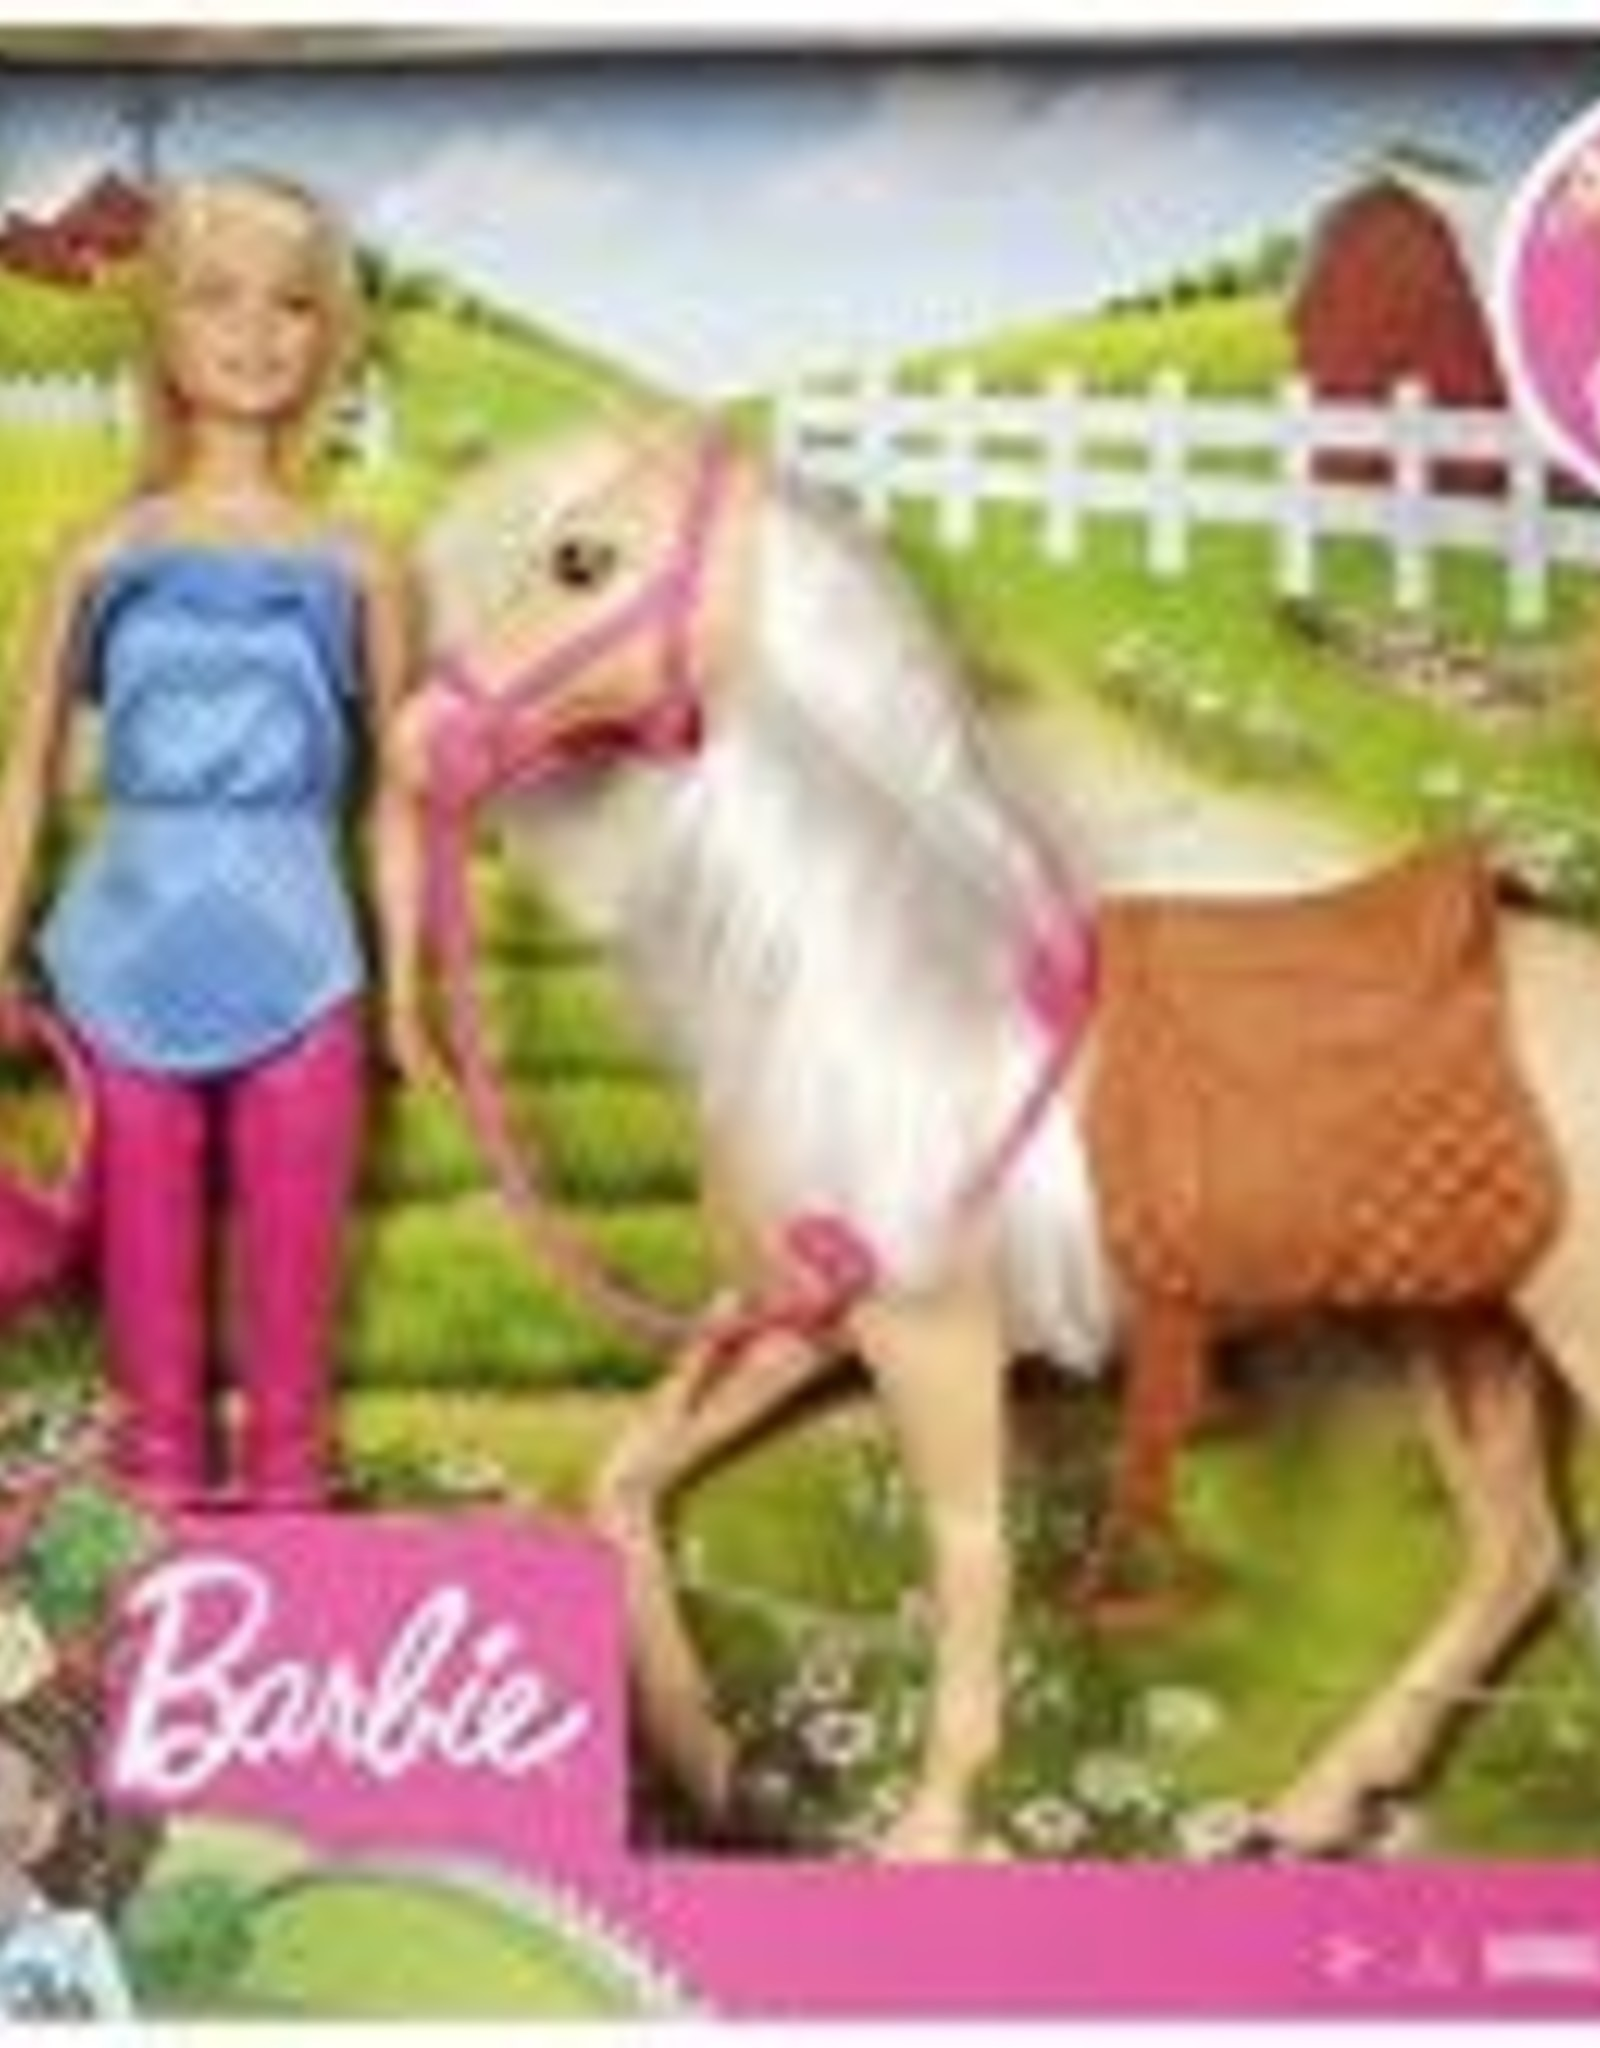 Barbie Barbie Doll & Horse